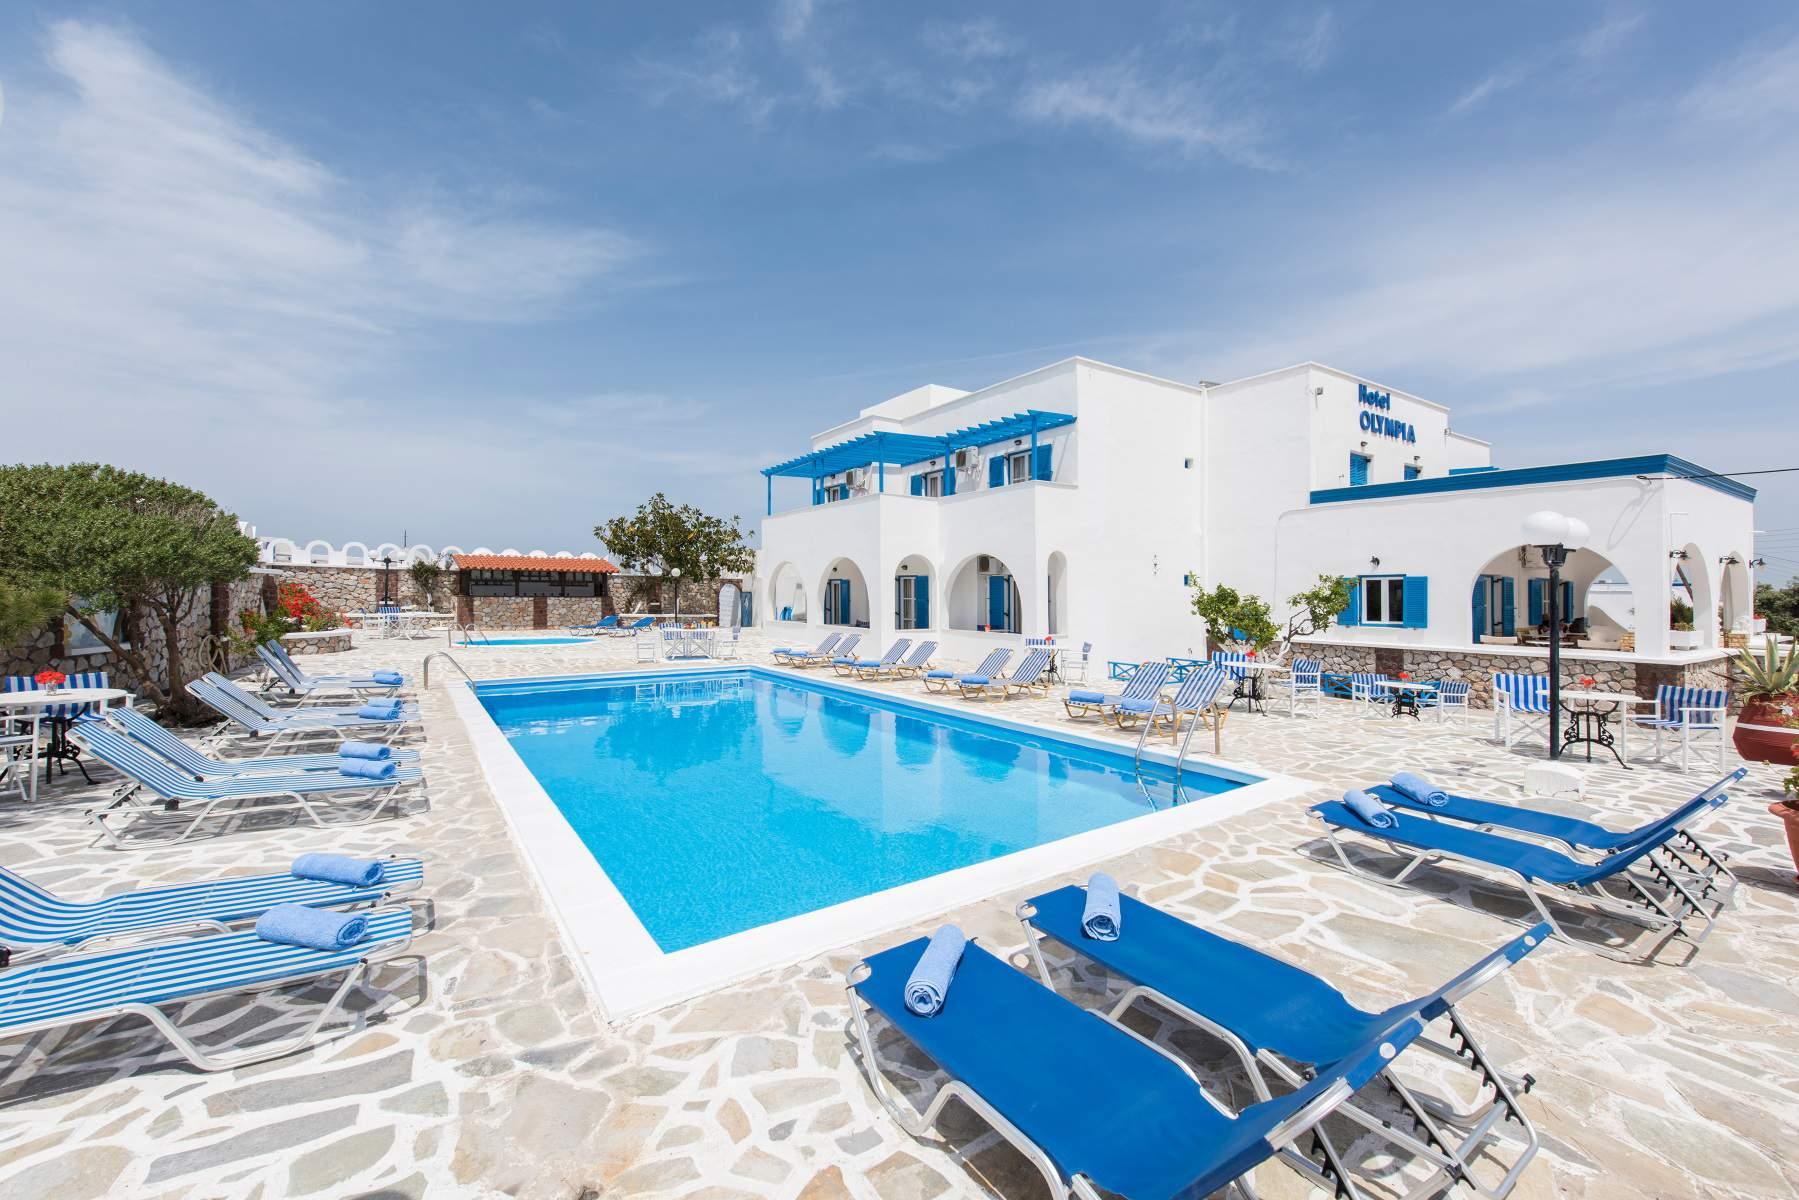 Hotel Olympia in Karterados Santorini Greece